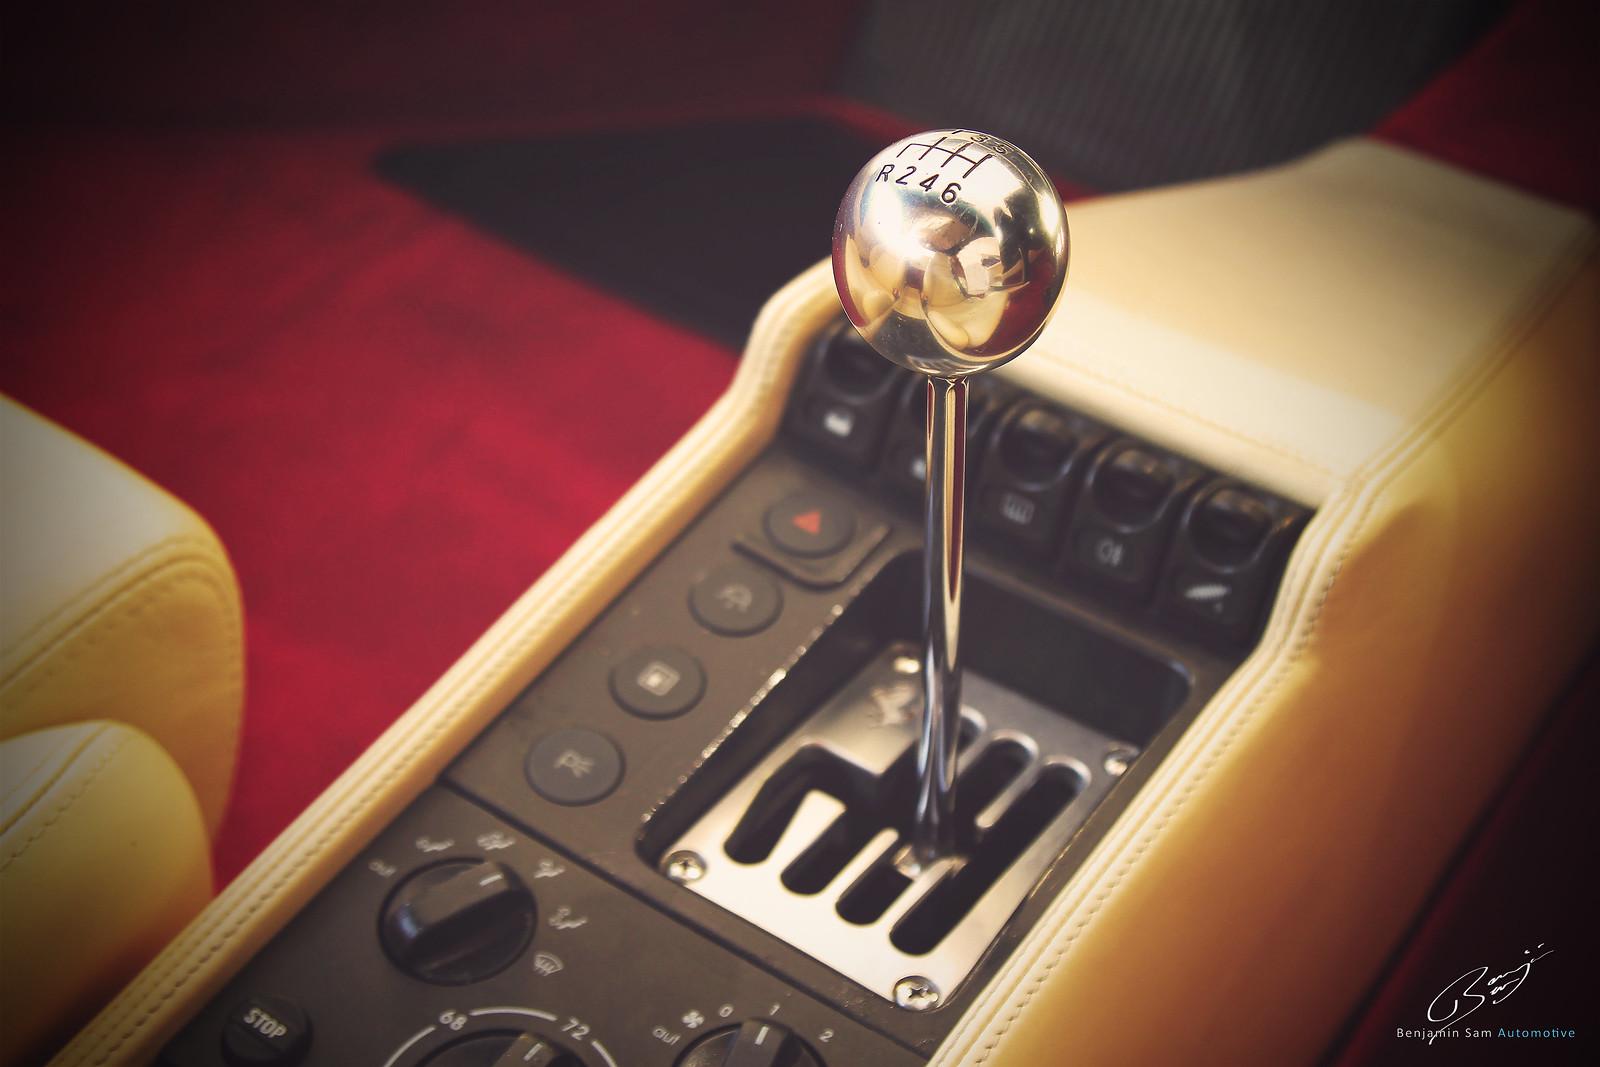 Ferrari F355 Gear Stick